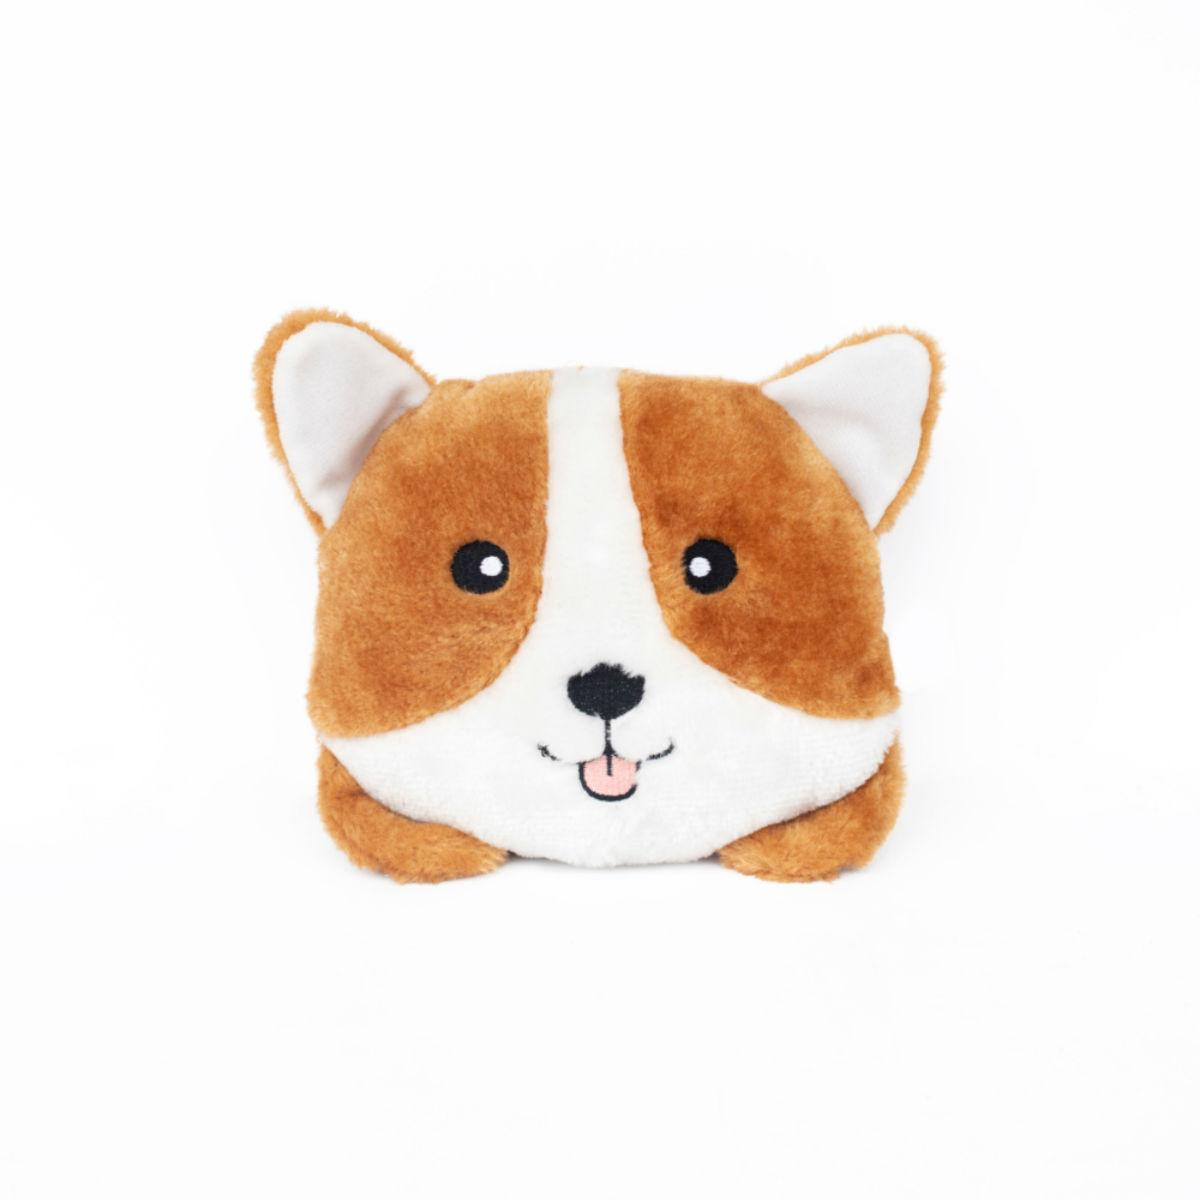 ZippyPaws Squeaky Buns Dog Toy - Corgi